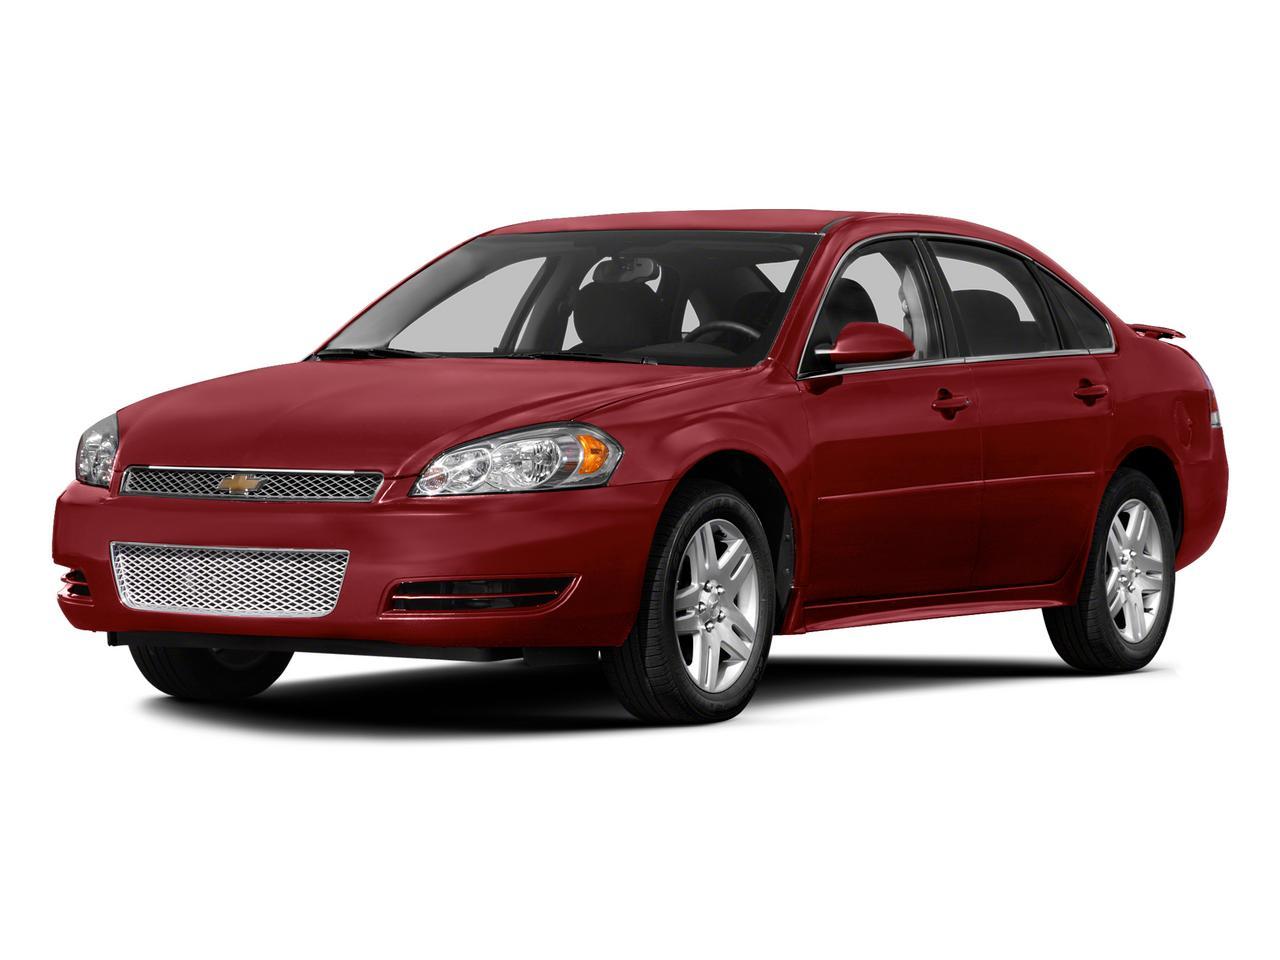 2015 Chevrolet Impala Limited Vehicle Photo in Killeen, TX 76541